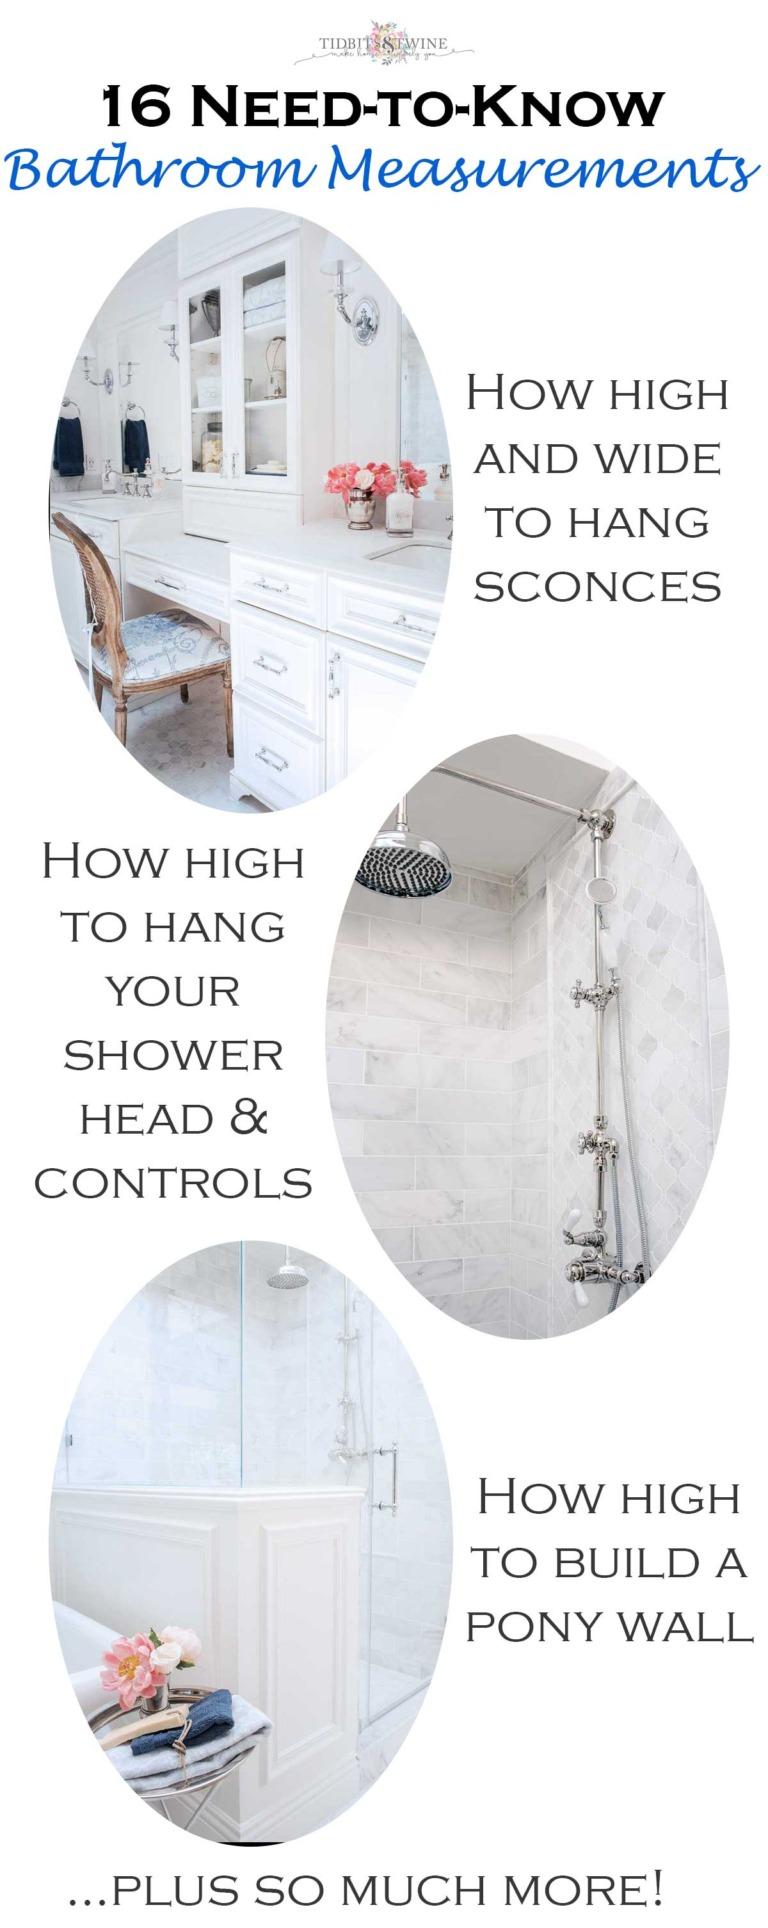 Need to Know Bathroom Measurements